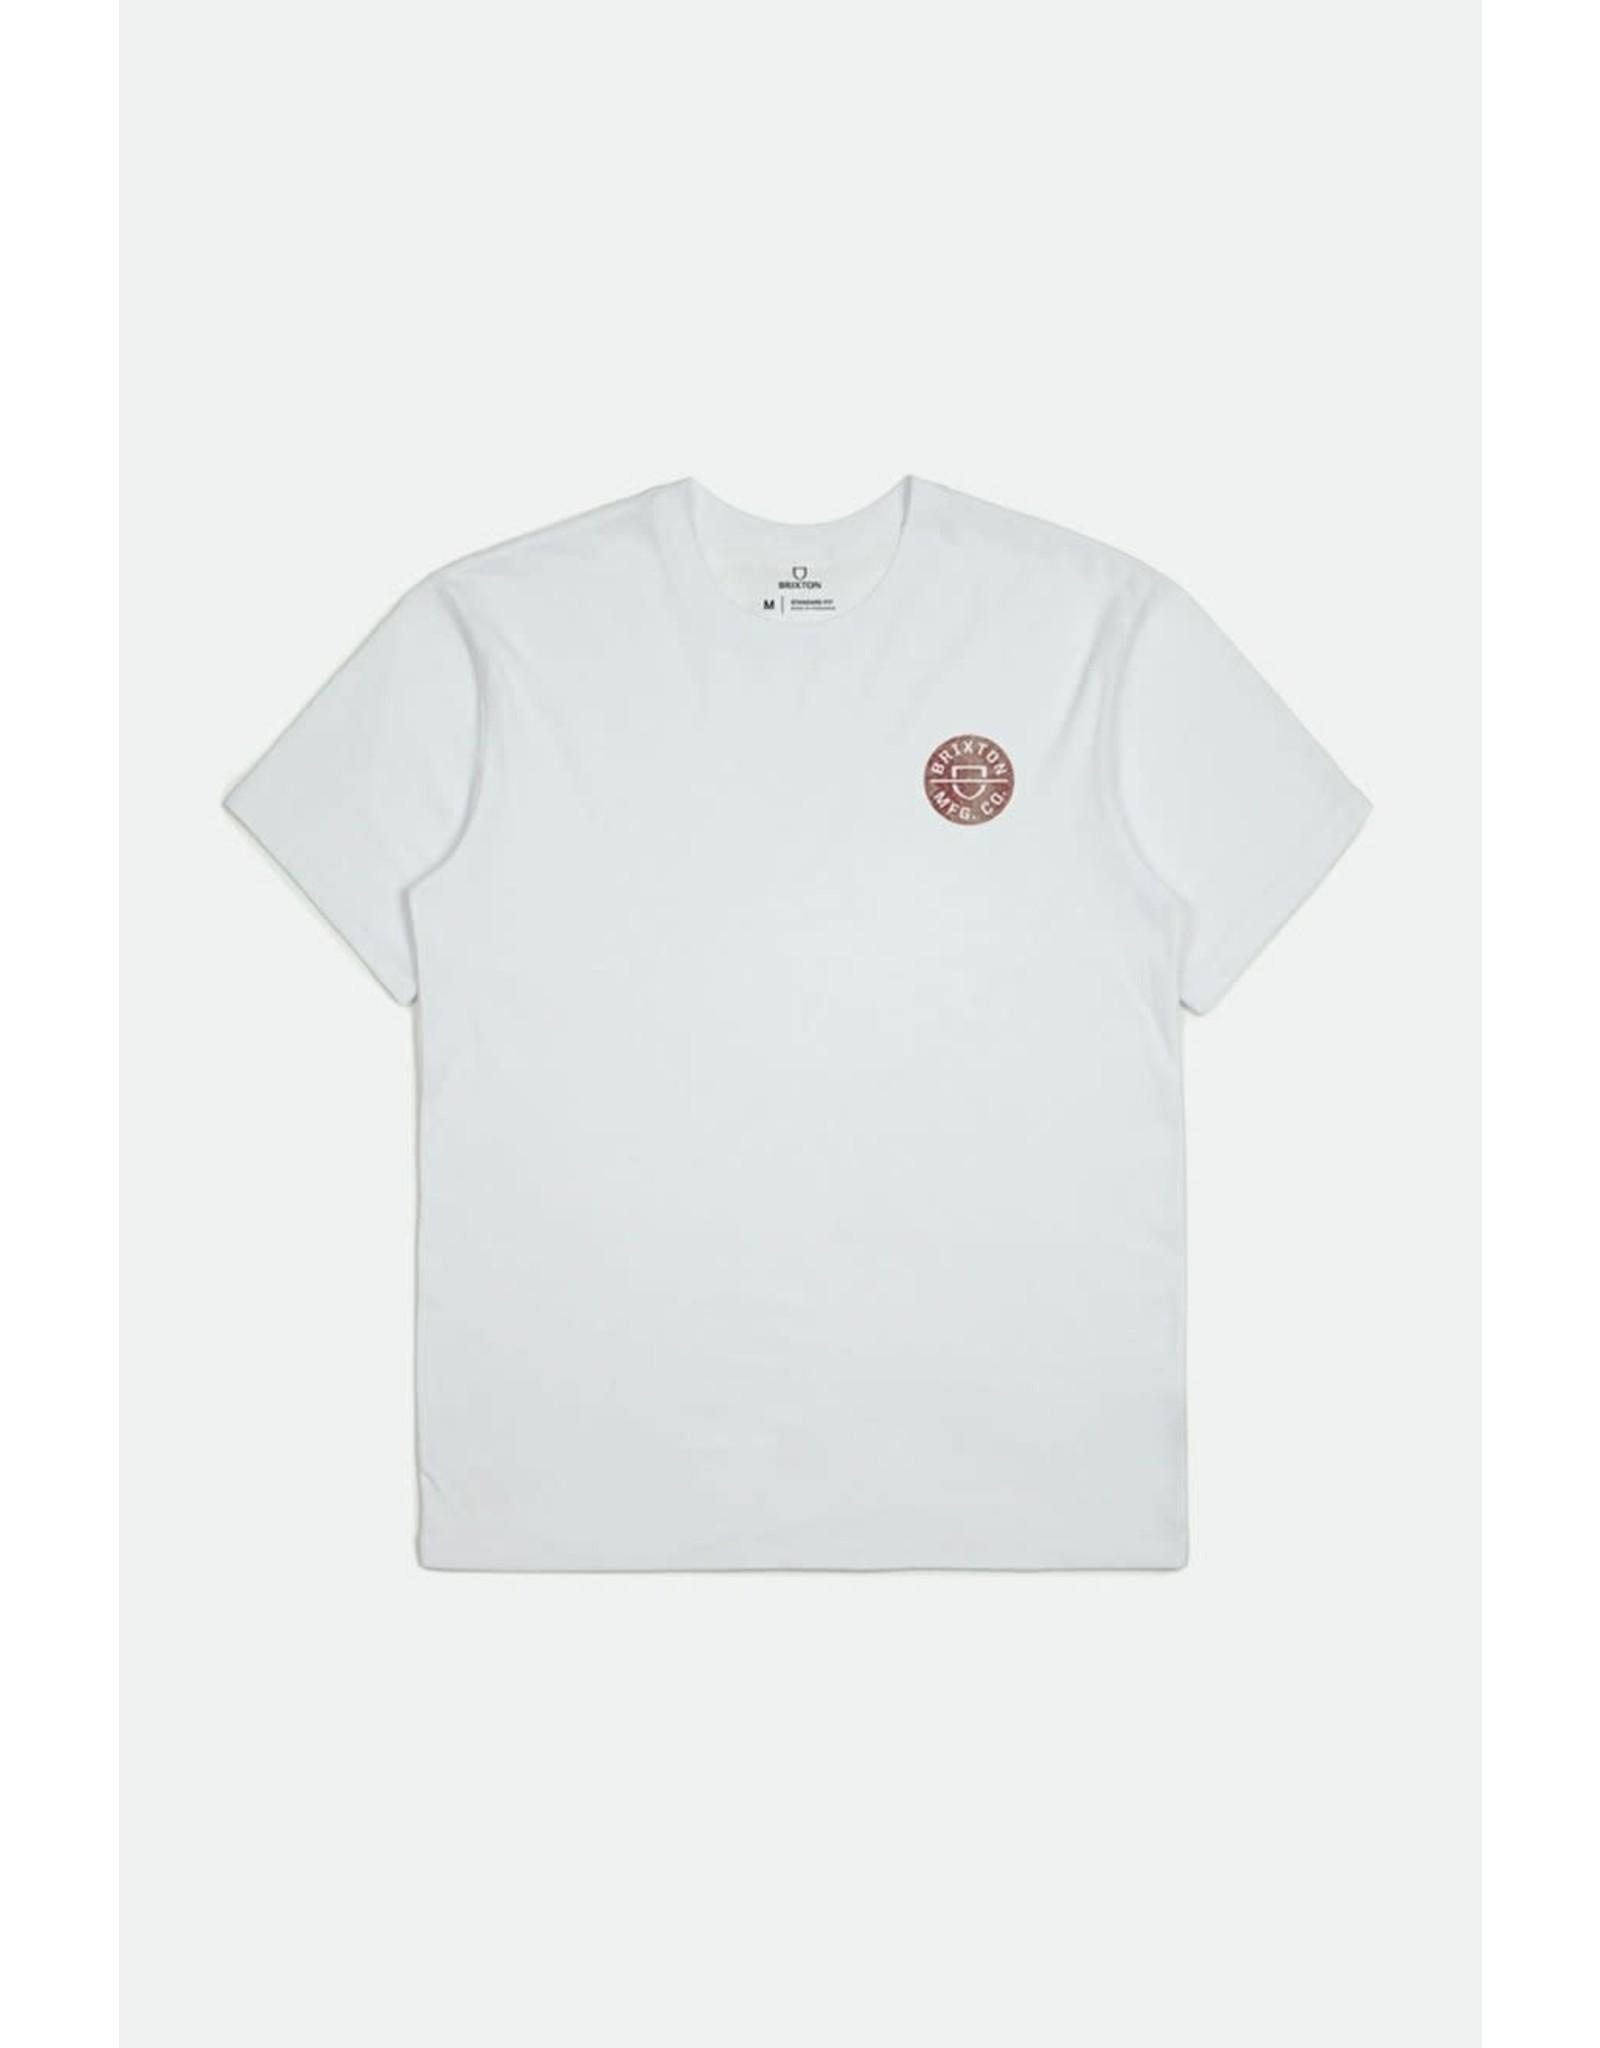 Brixton Brixton - T-shirt homme crest II white